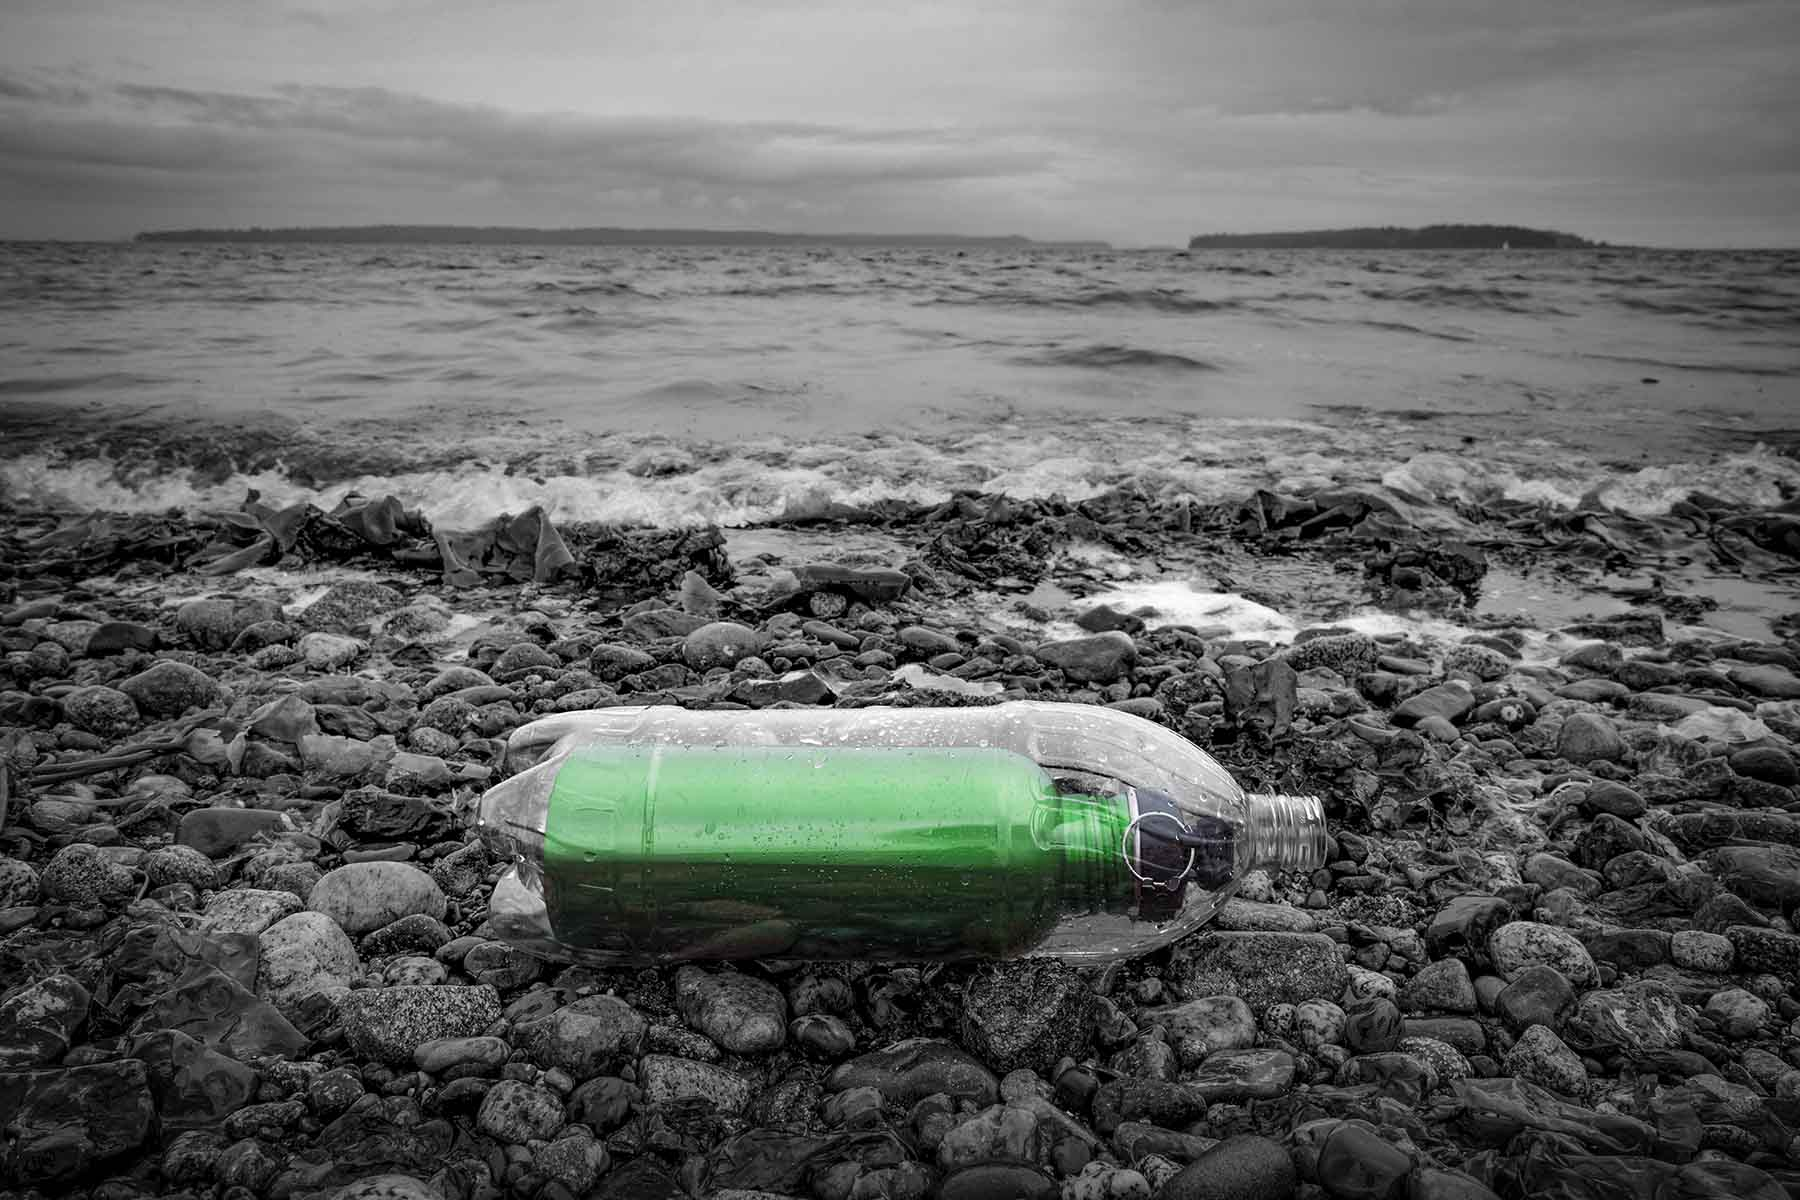 A green refillable bottle rests inside a plastic bottle